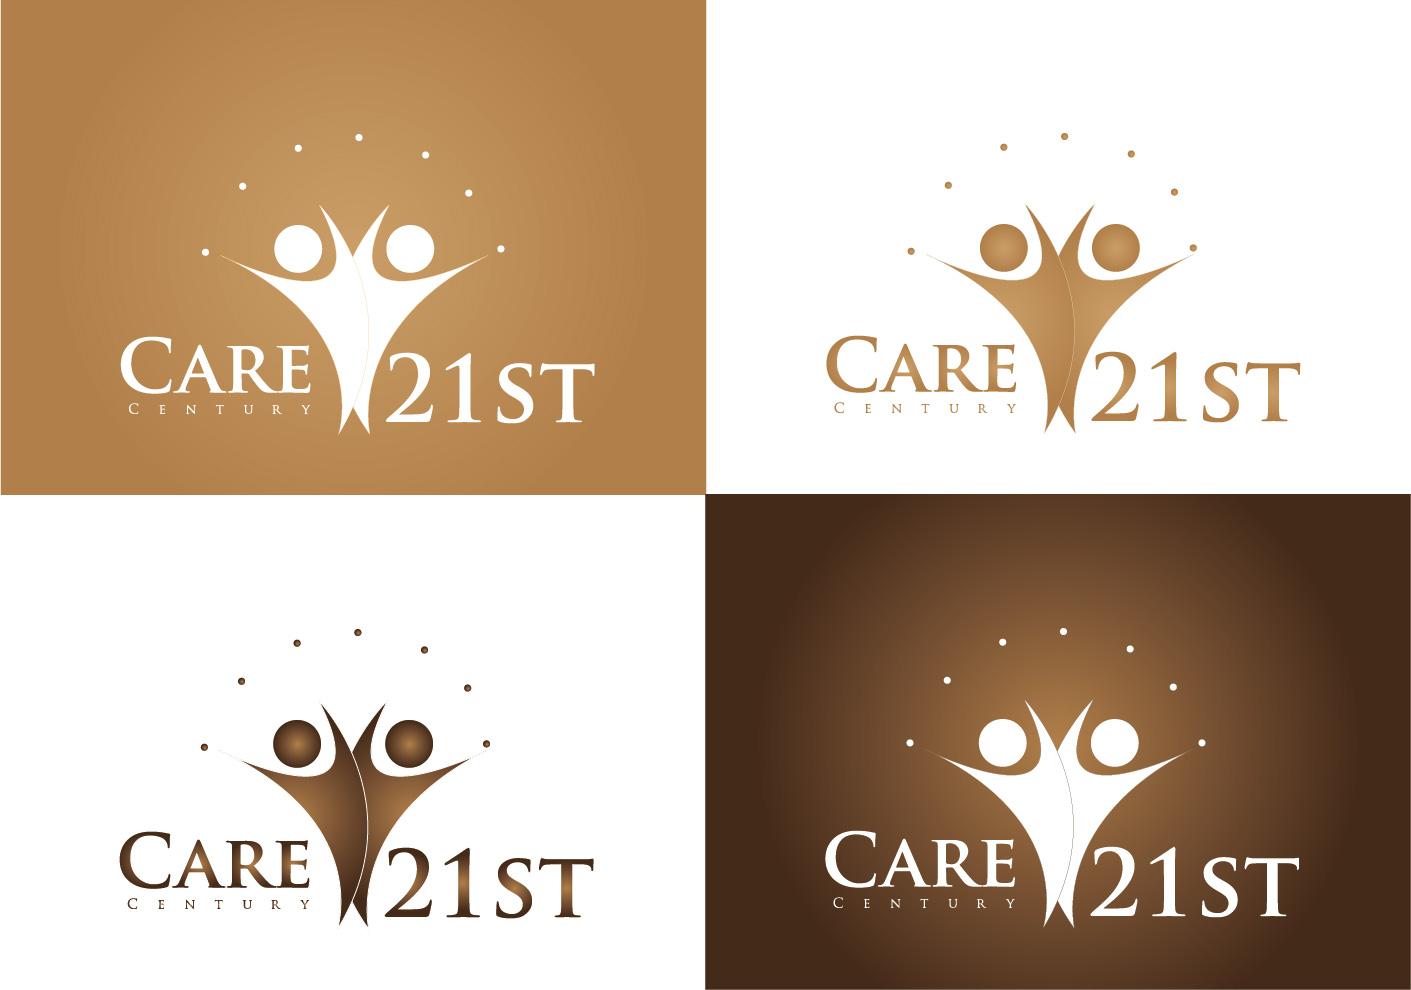 Care21stcentury LTD